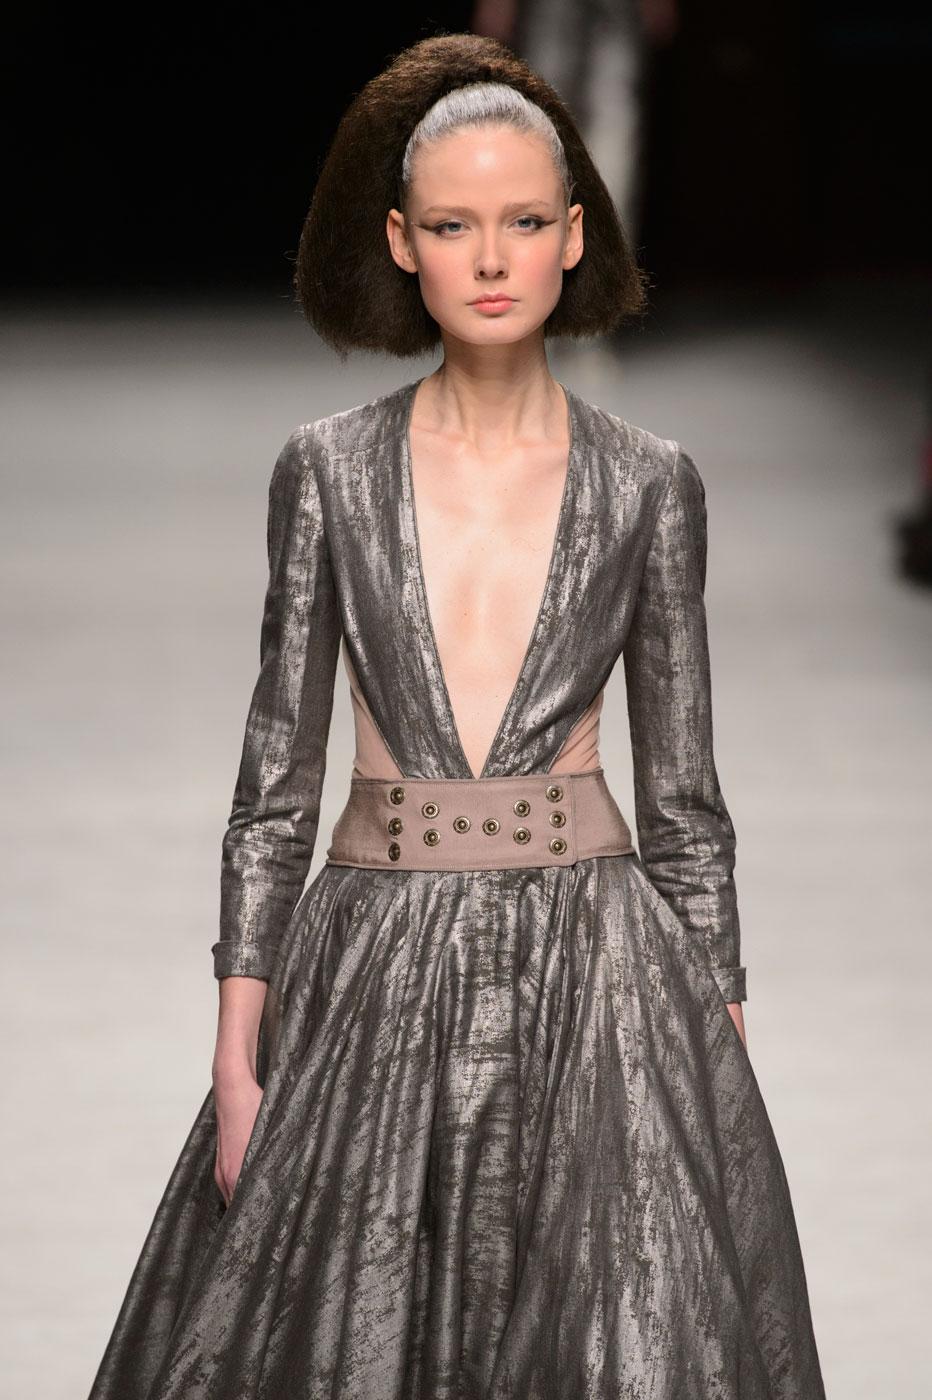 Julien-Fournie-Prive-fashion-runway-show-haute-couture-paris-spring-2015-the-impression-33